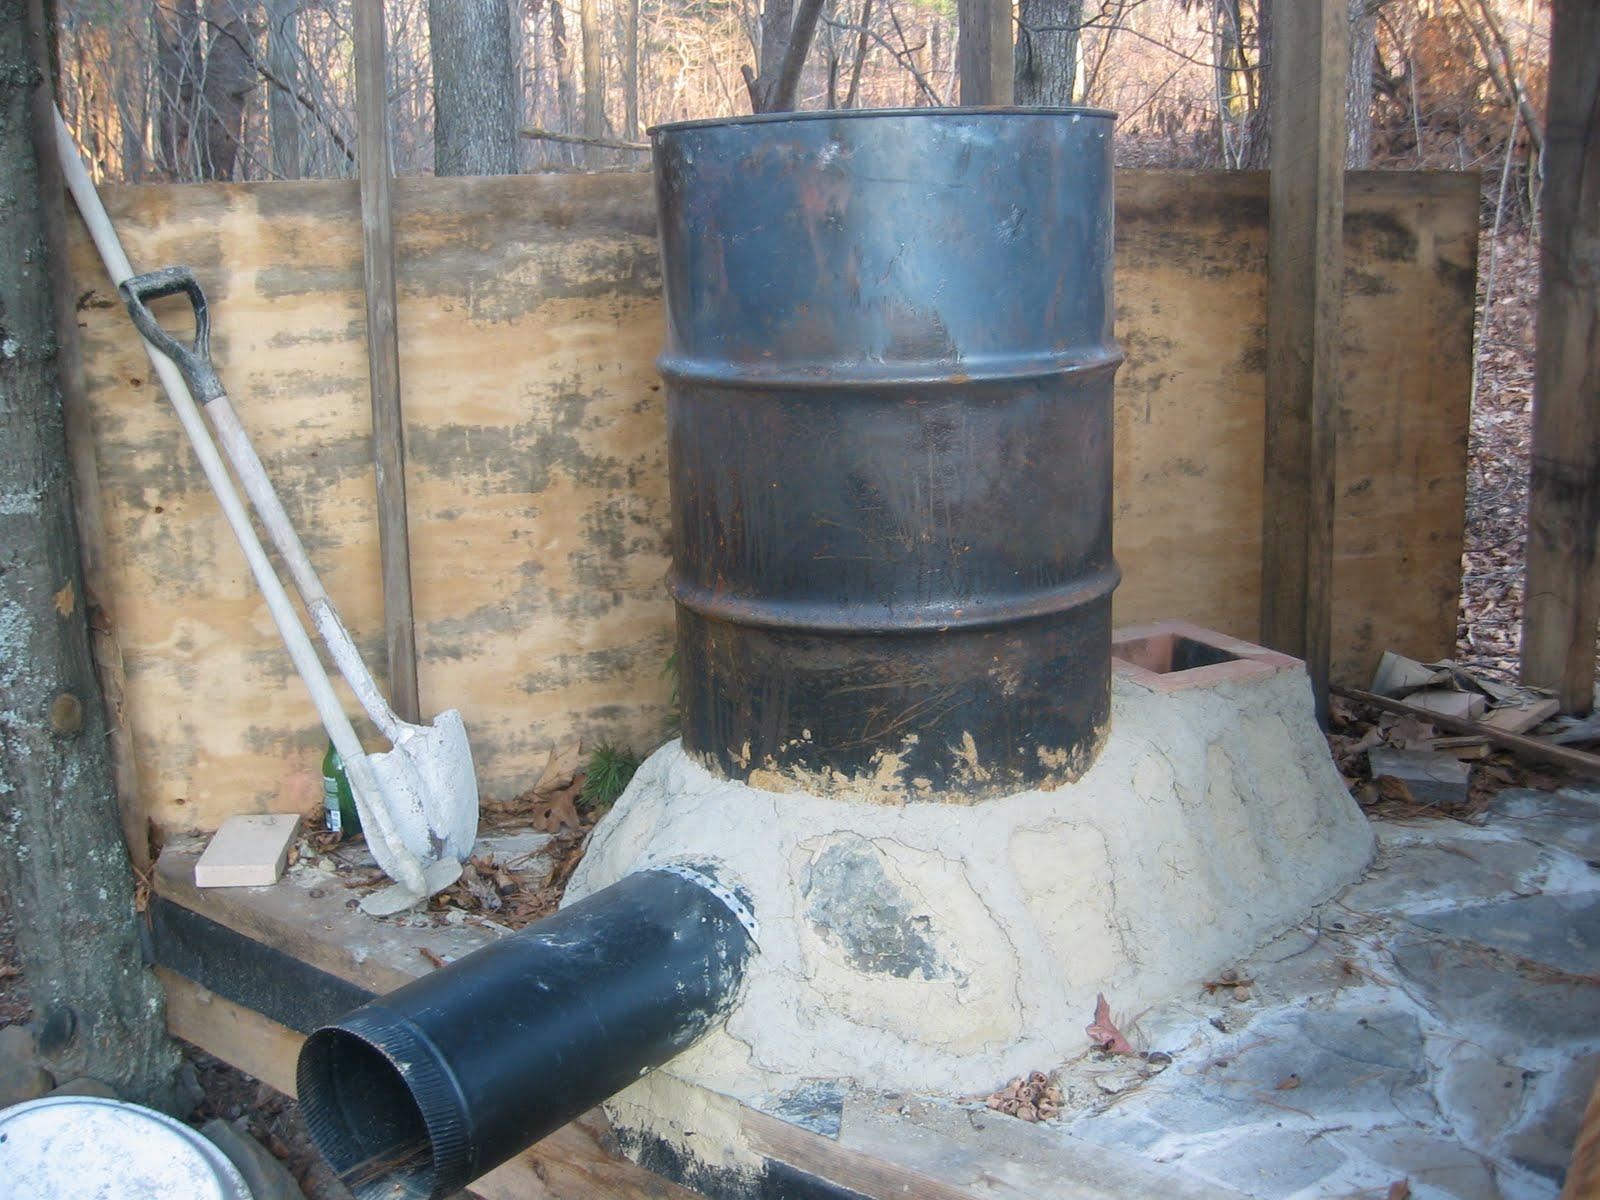 La rocket stove ovvero una stufa fai da te self made for Stufa autocostruita